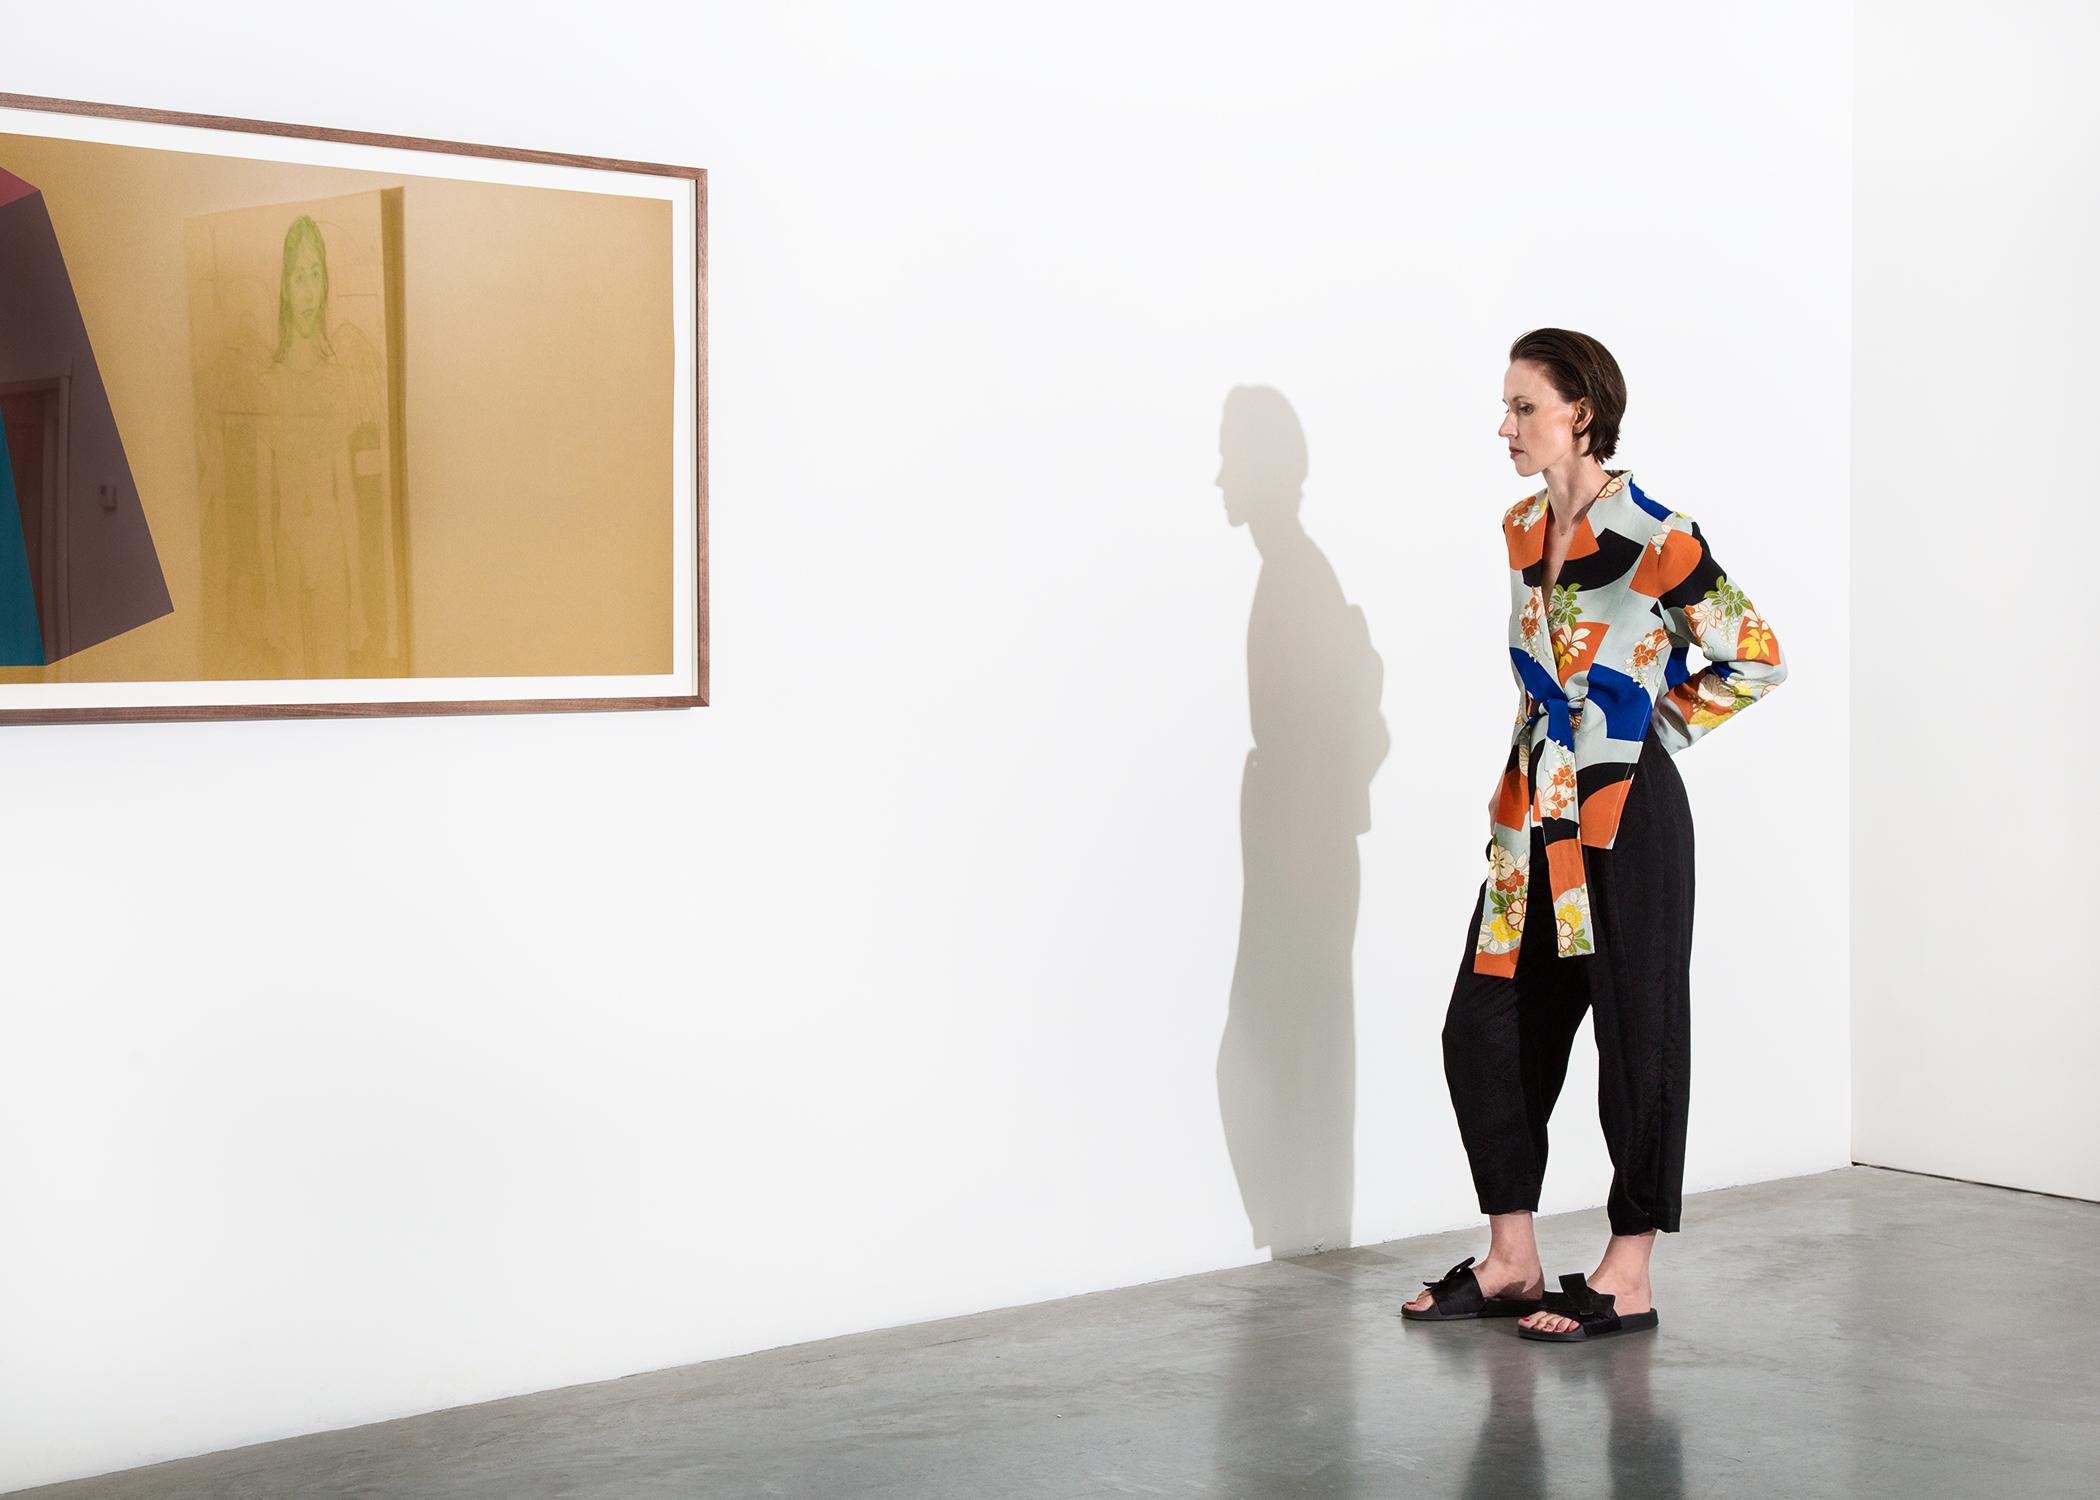 Works by Sol Lewitt / Samara Umbral (in reflection)  @samaraumbral